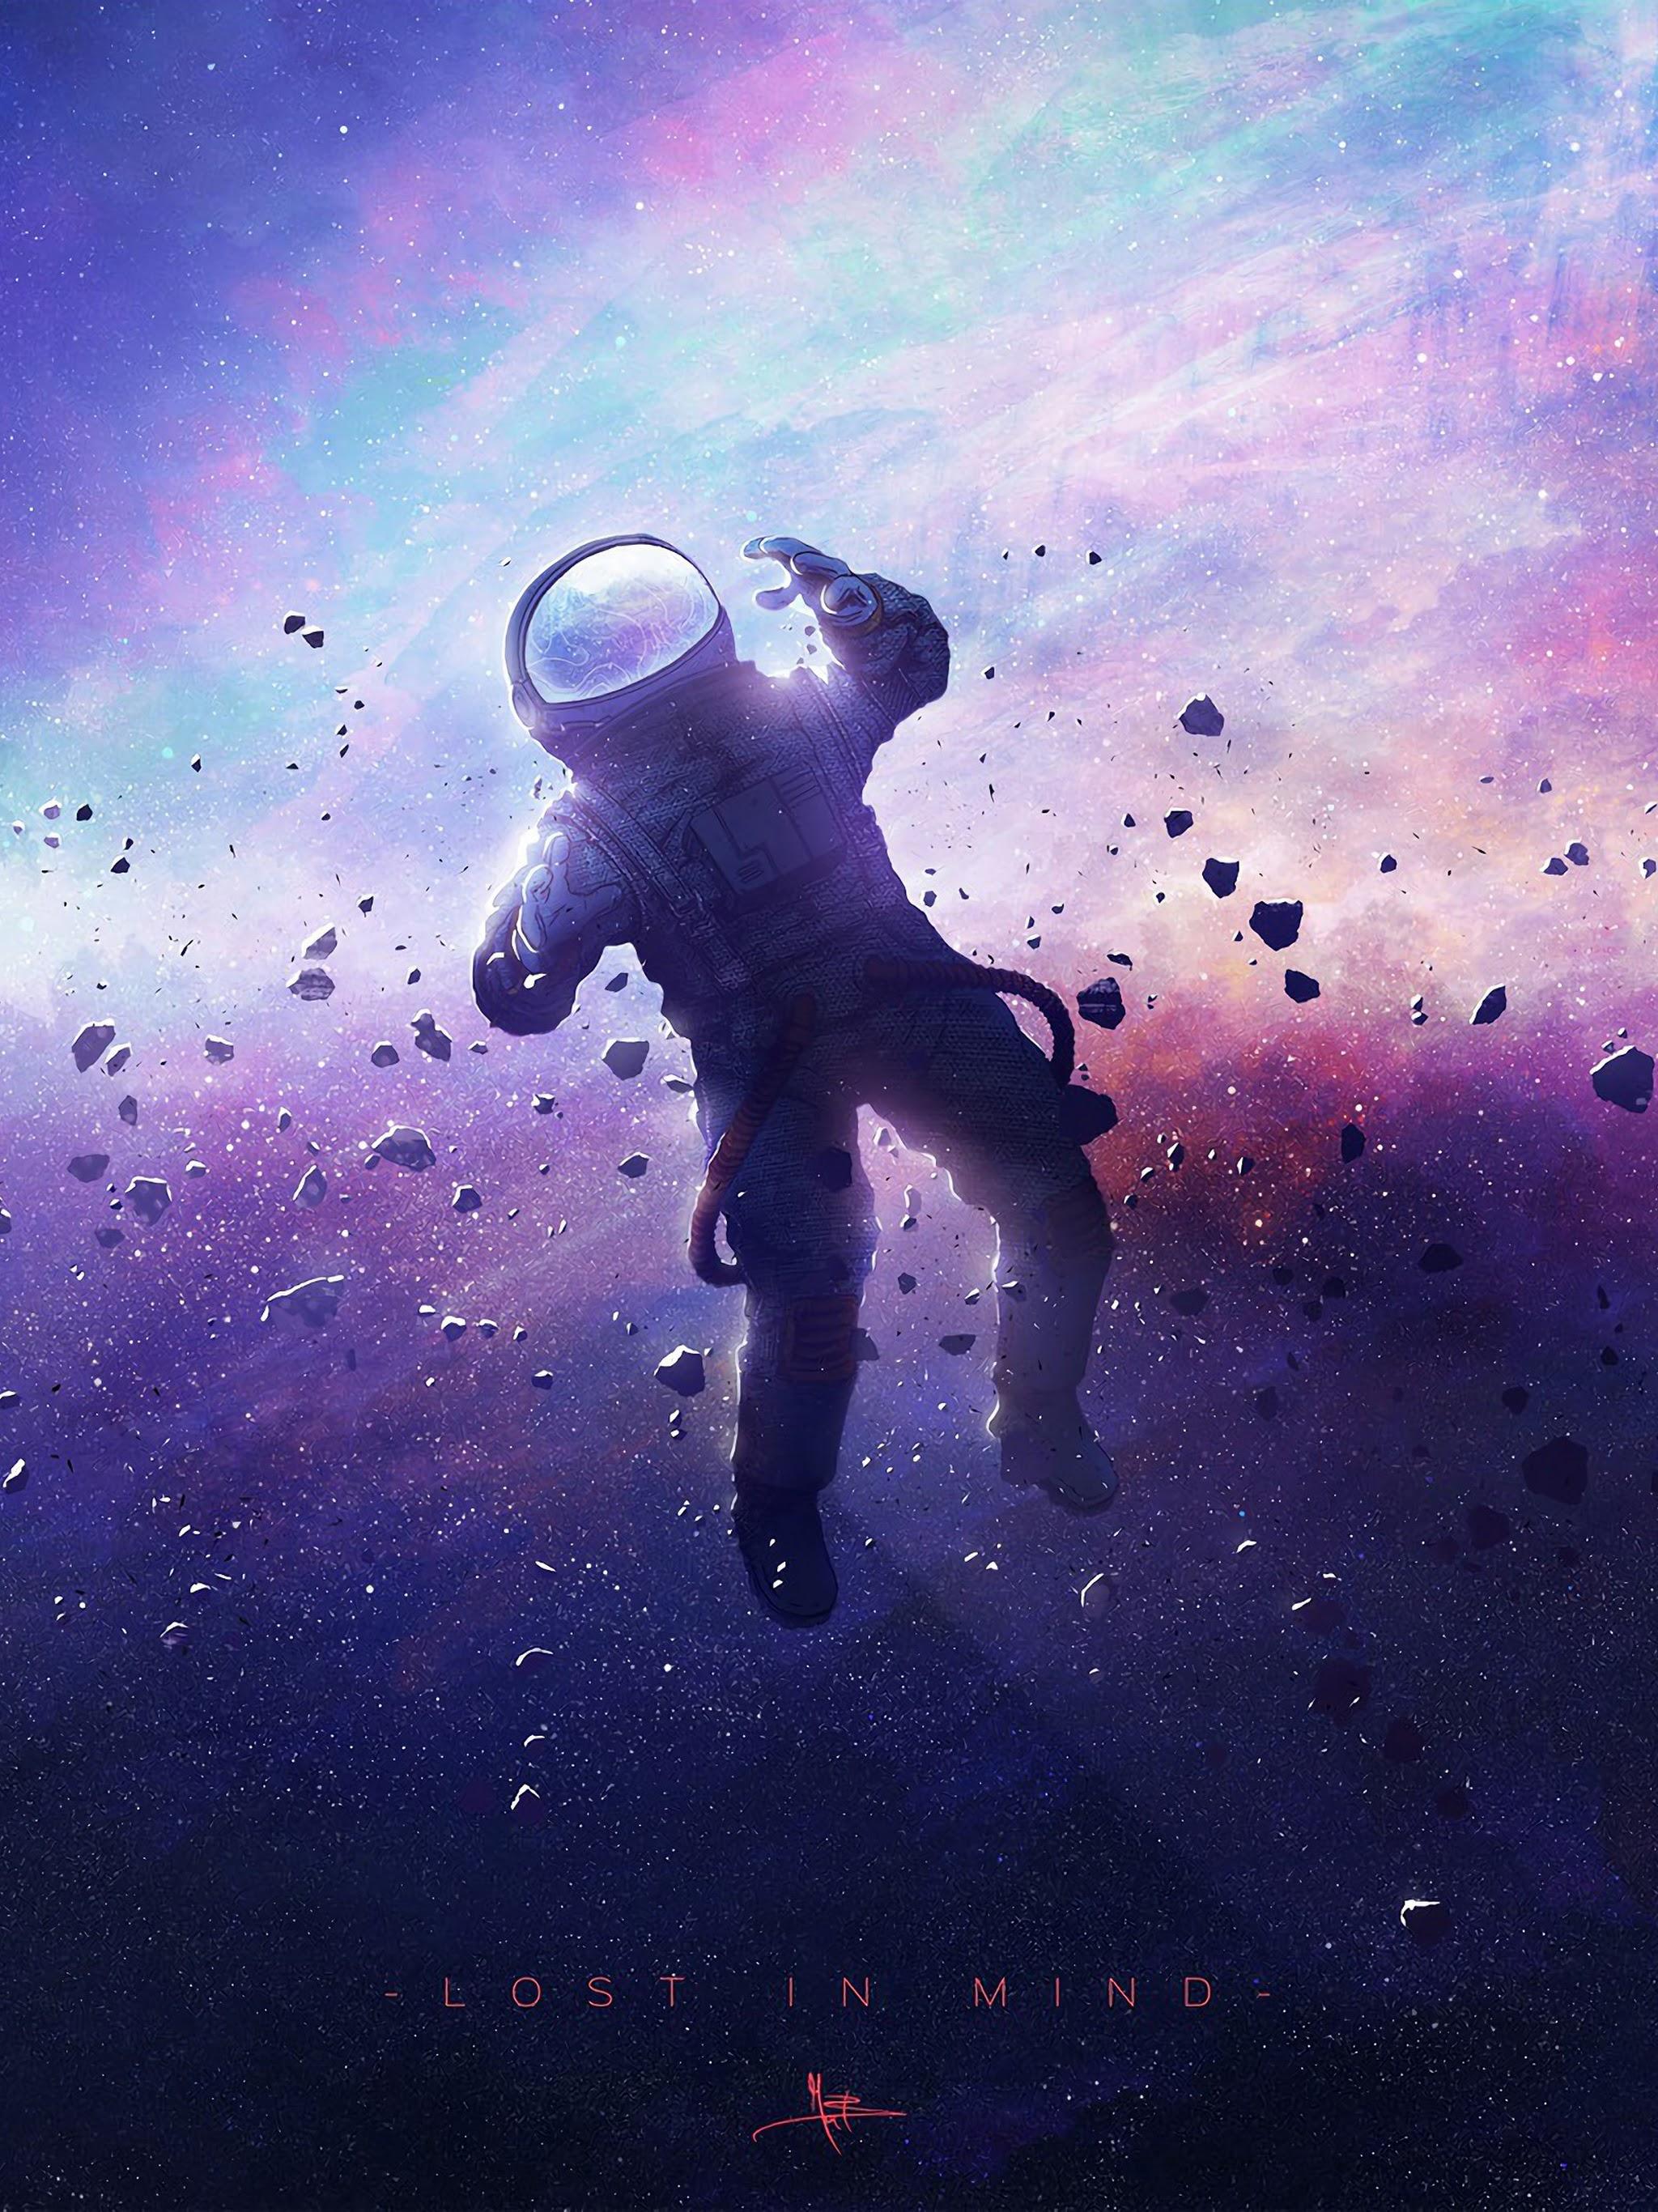 Cartoon Astronaut Wallpaper 4k